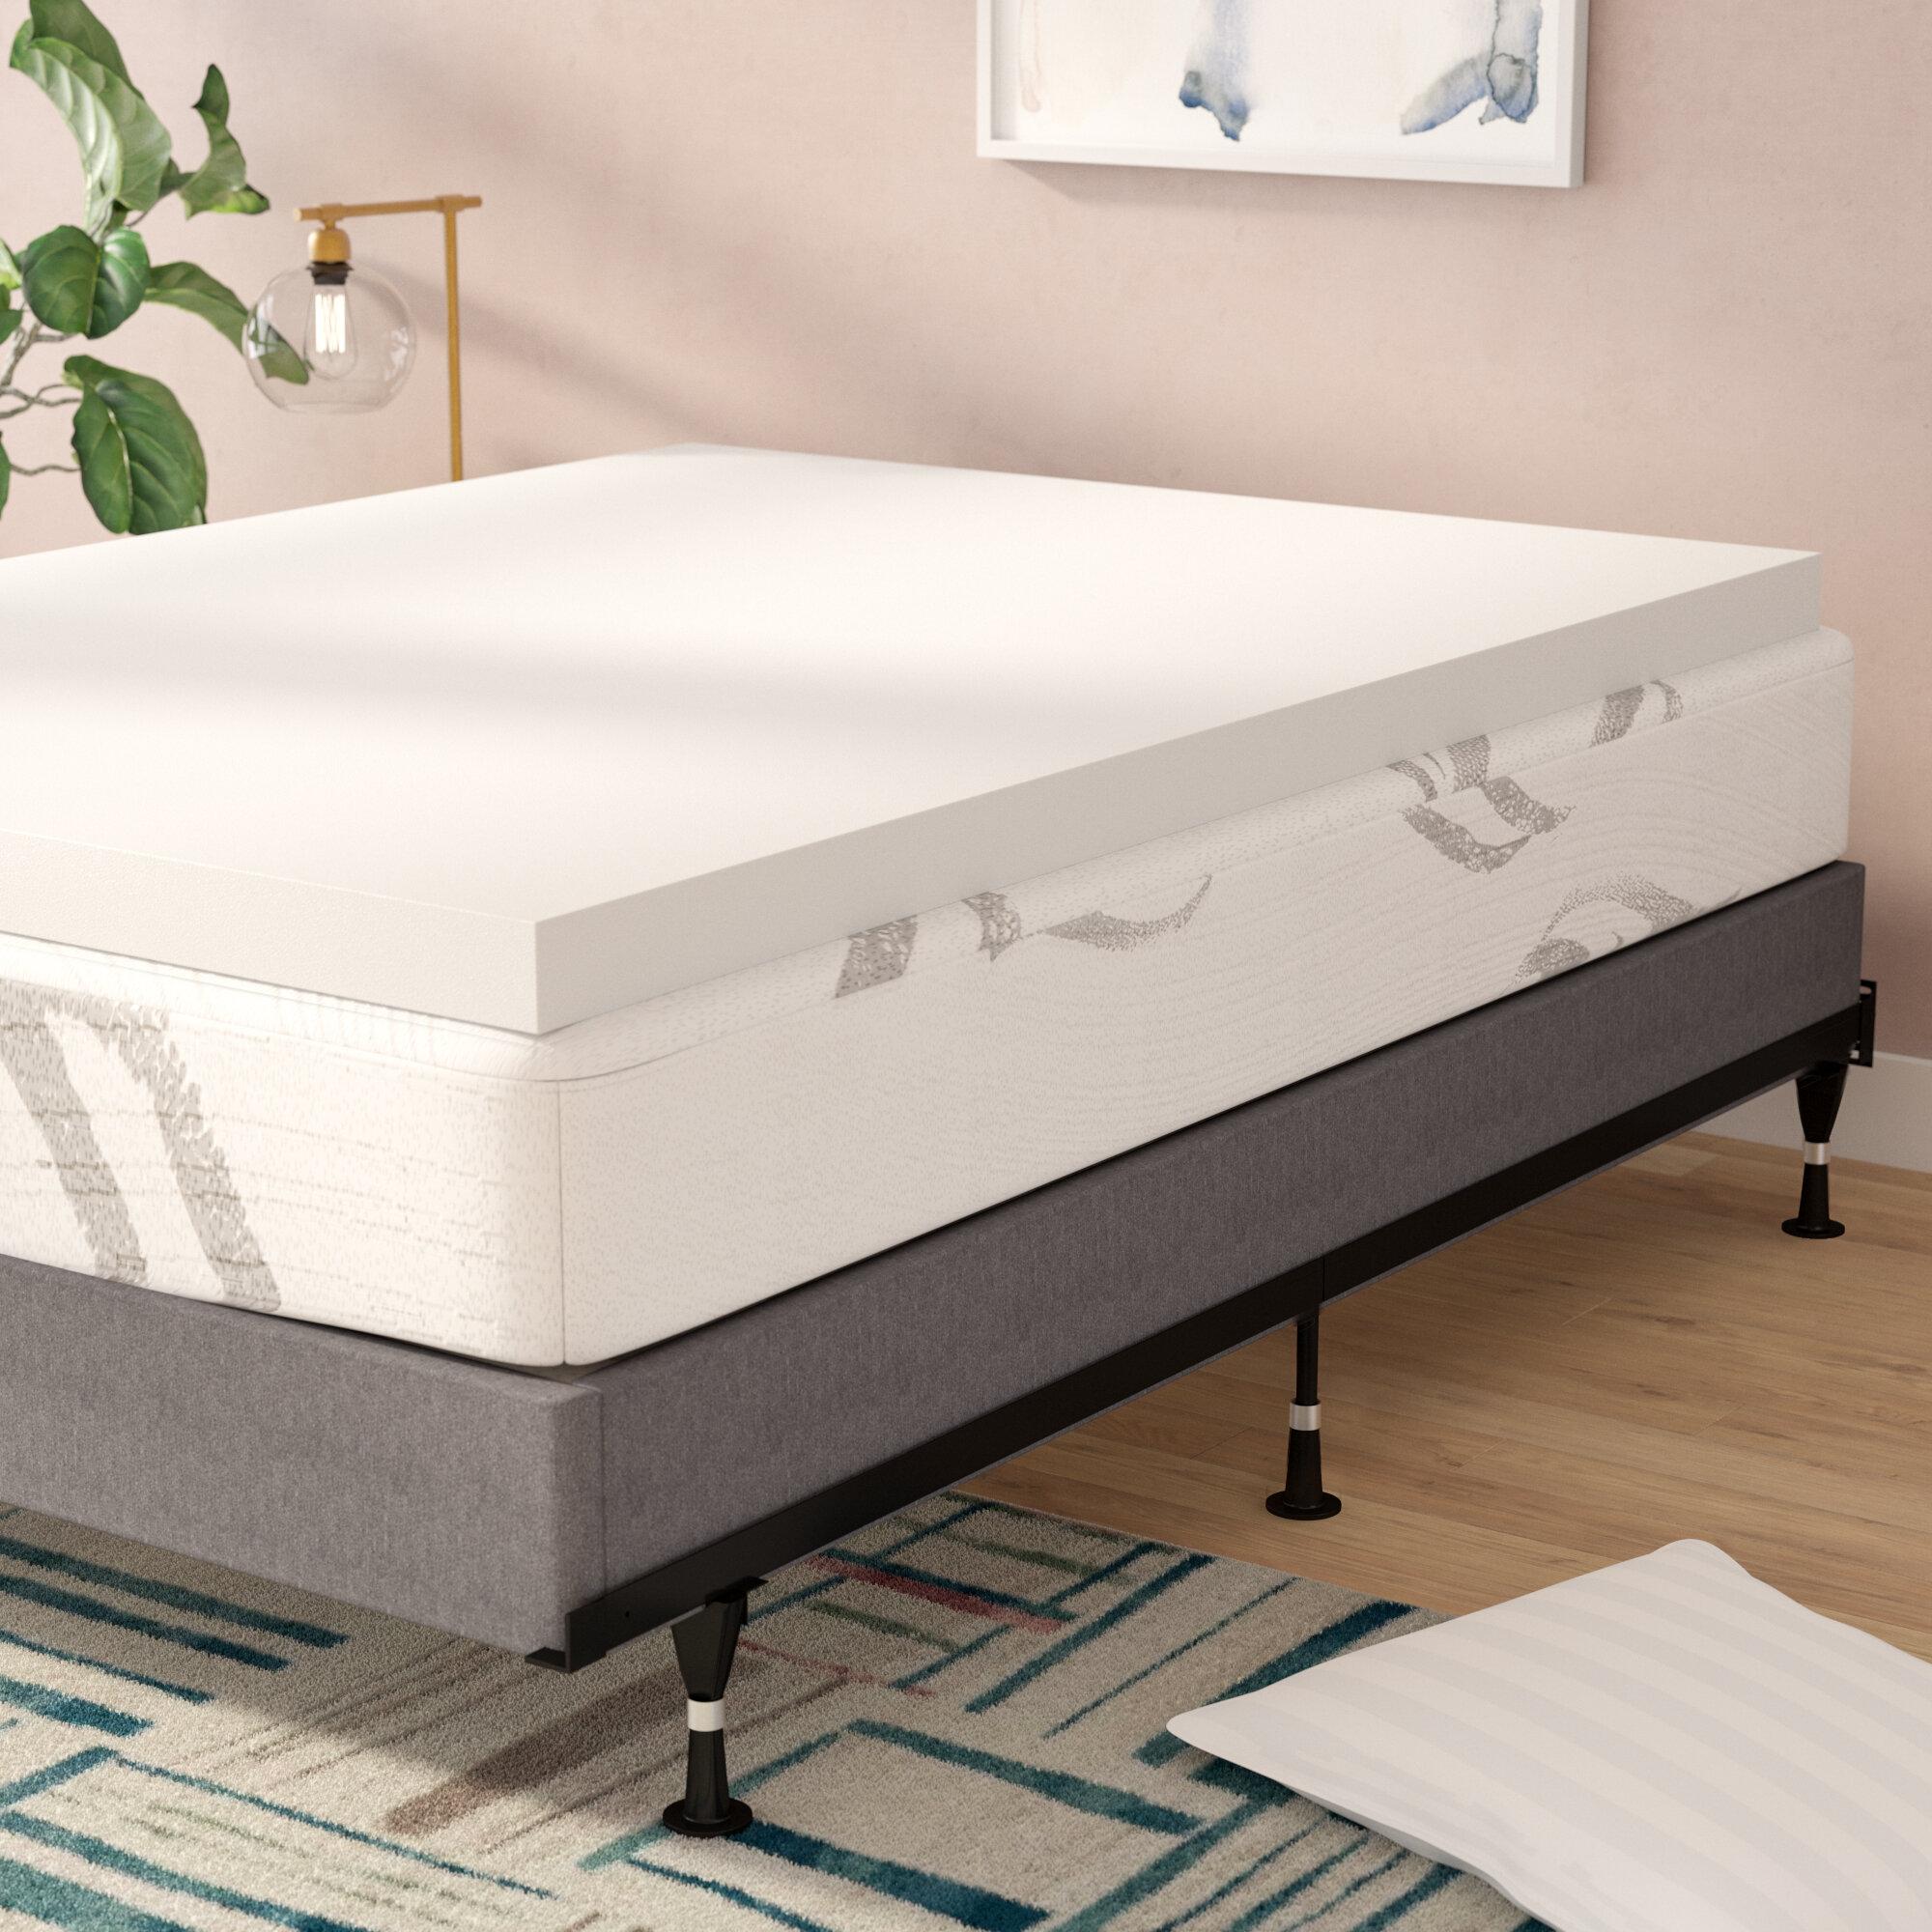 plus topper memory toppers aerus sensus foam mattress